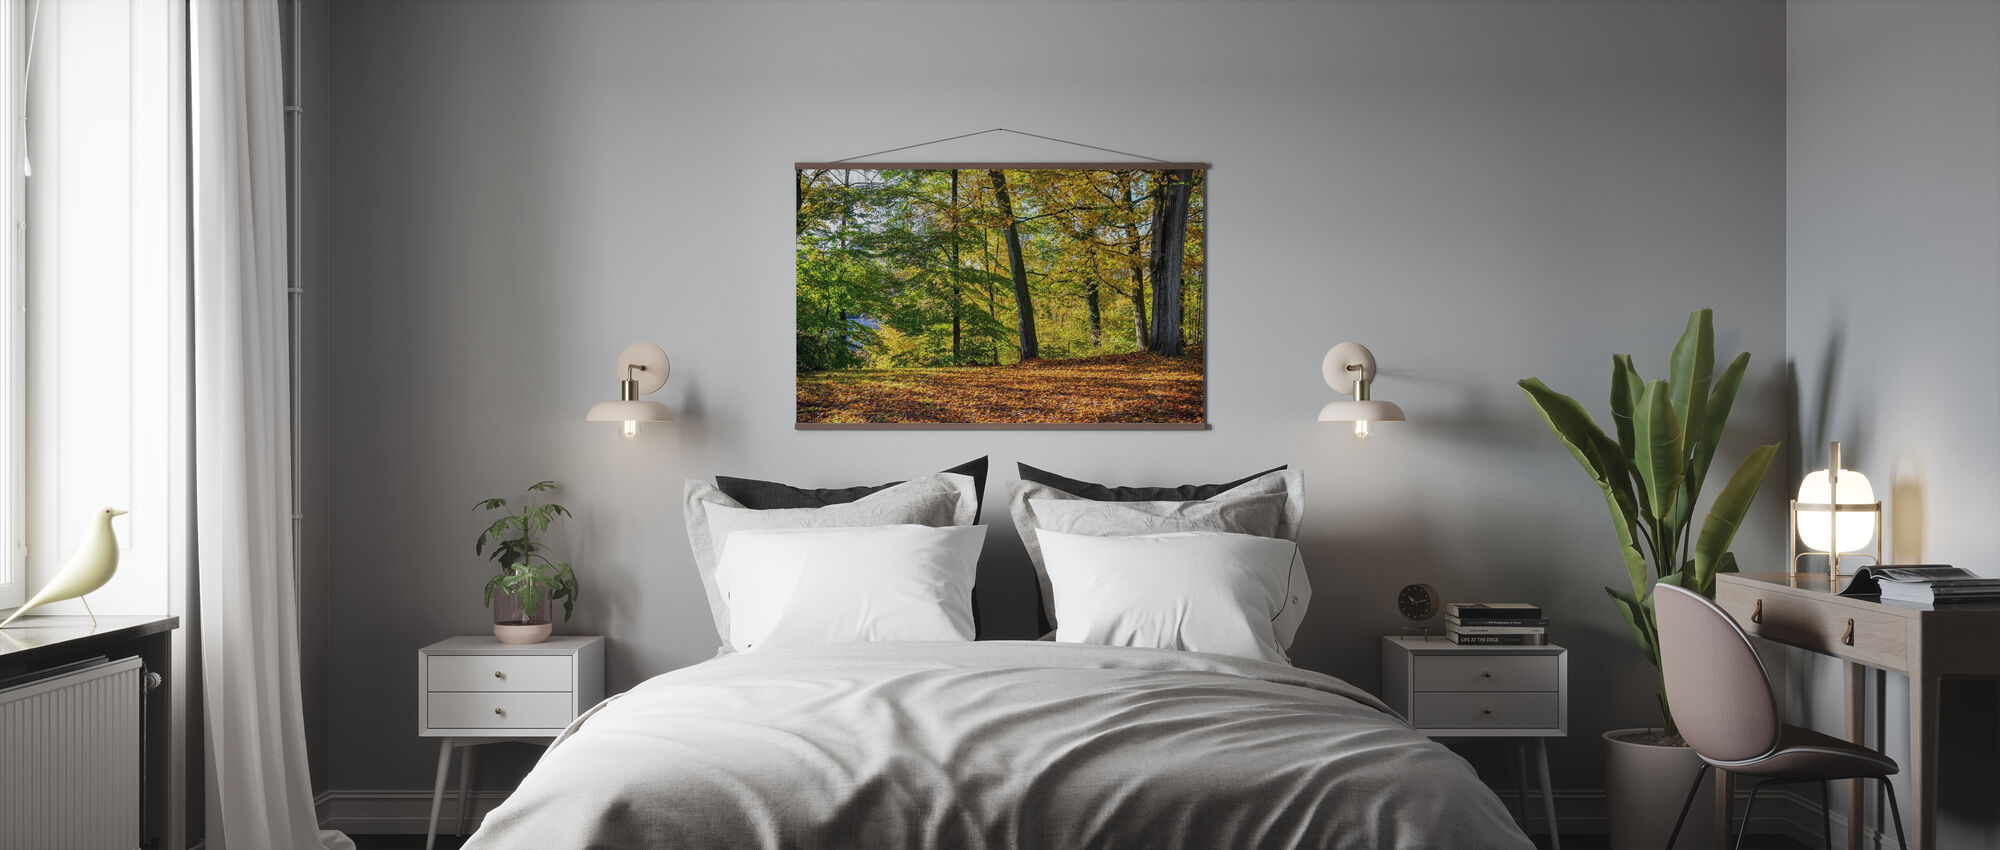 Høst skog - Plakat - Soverom